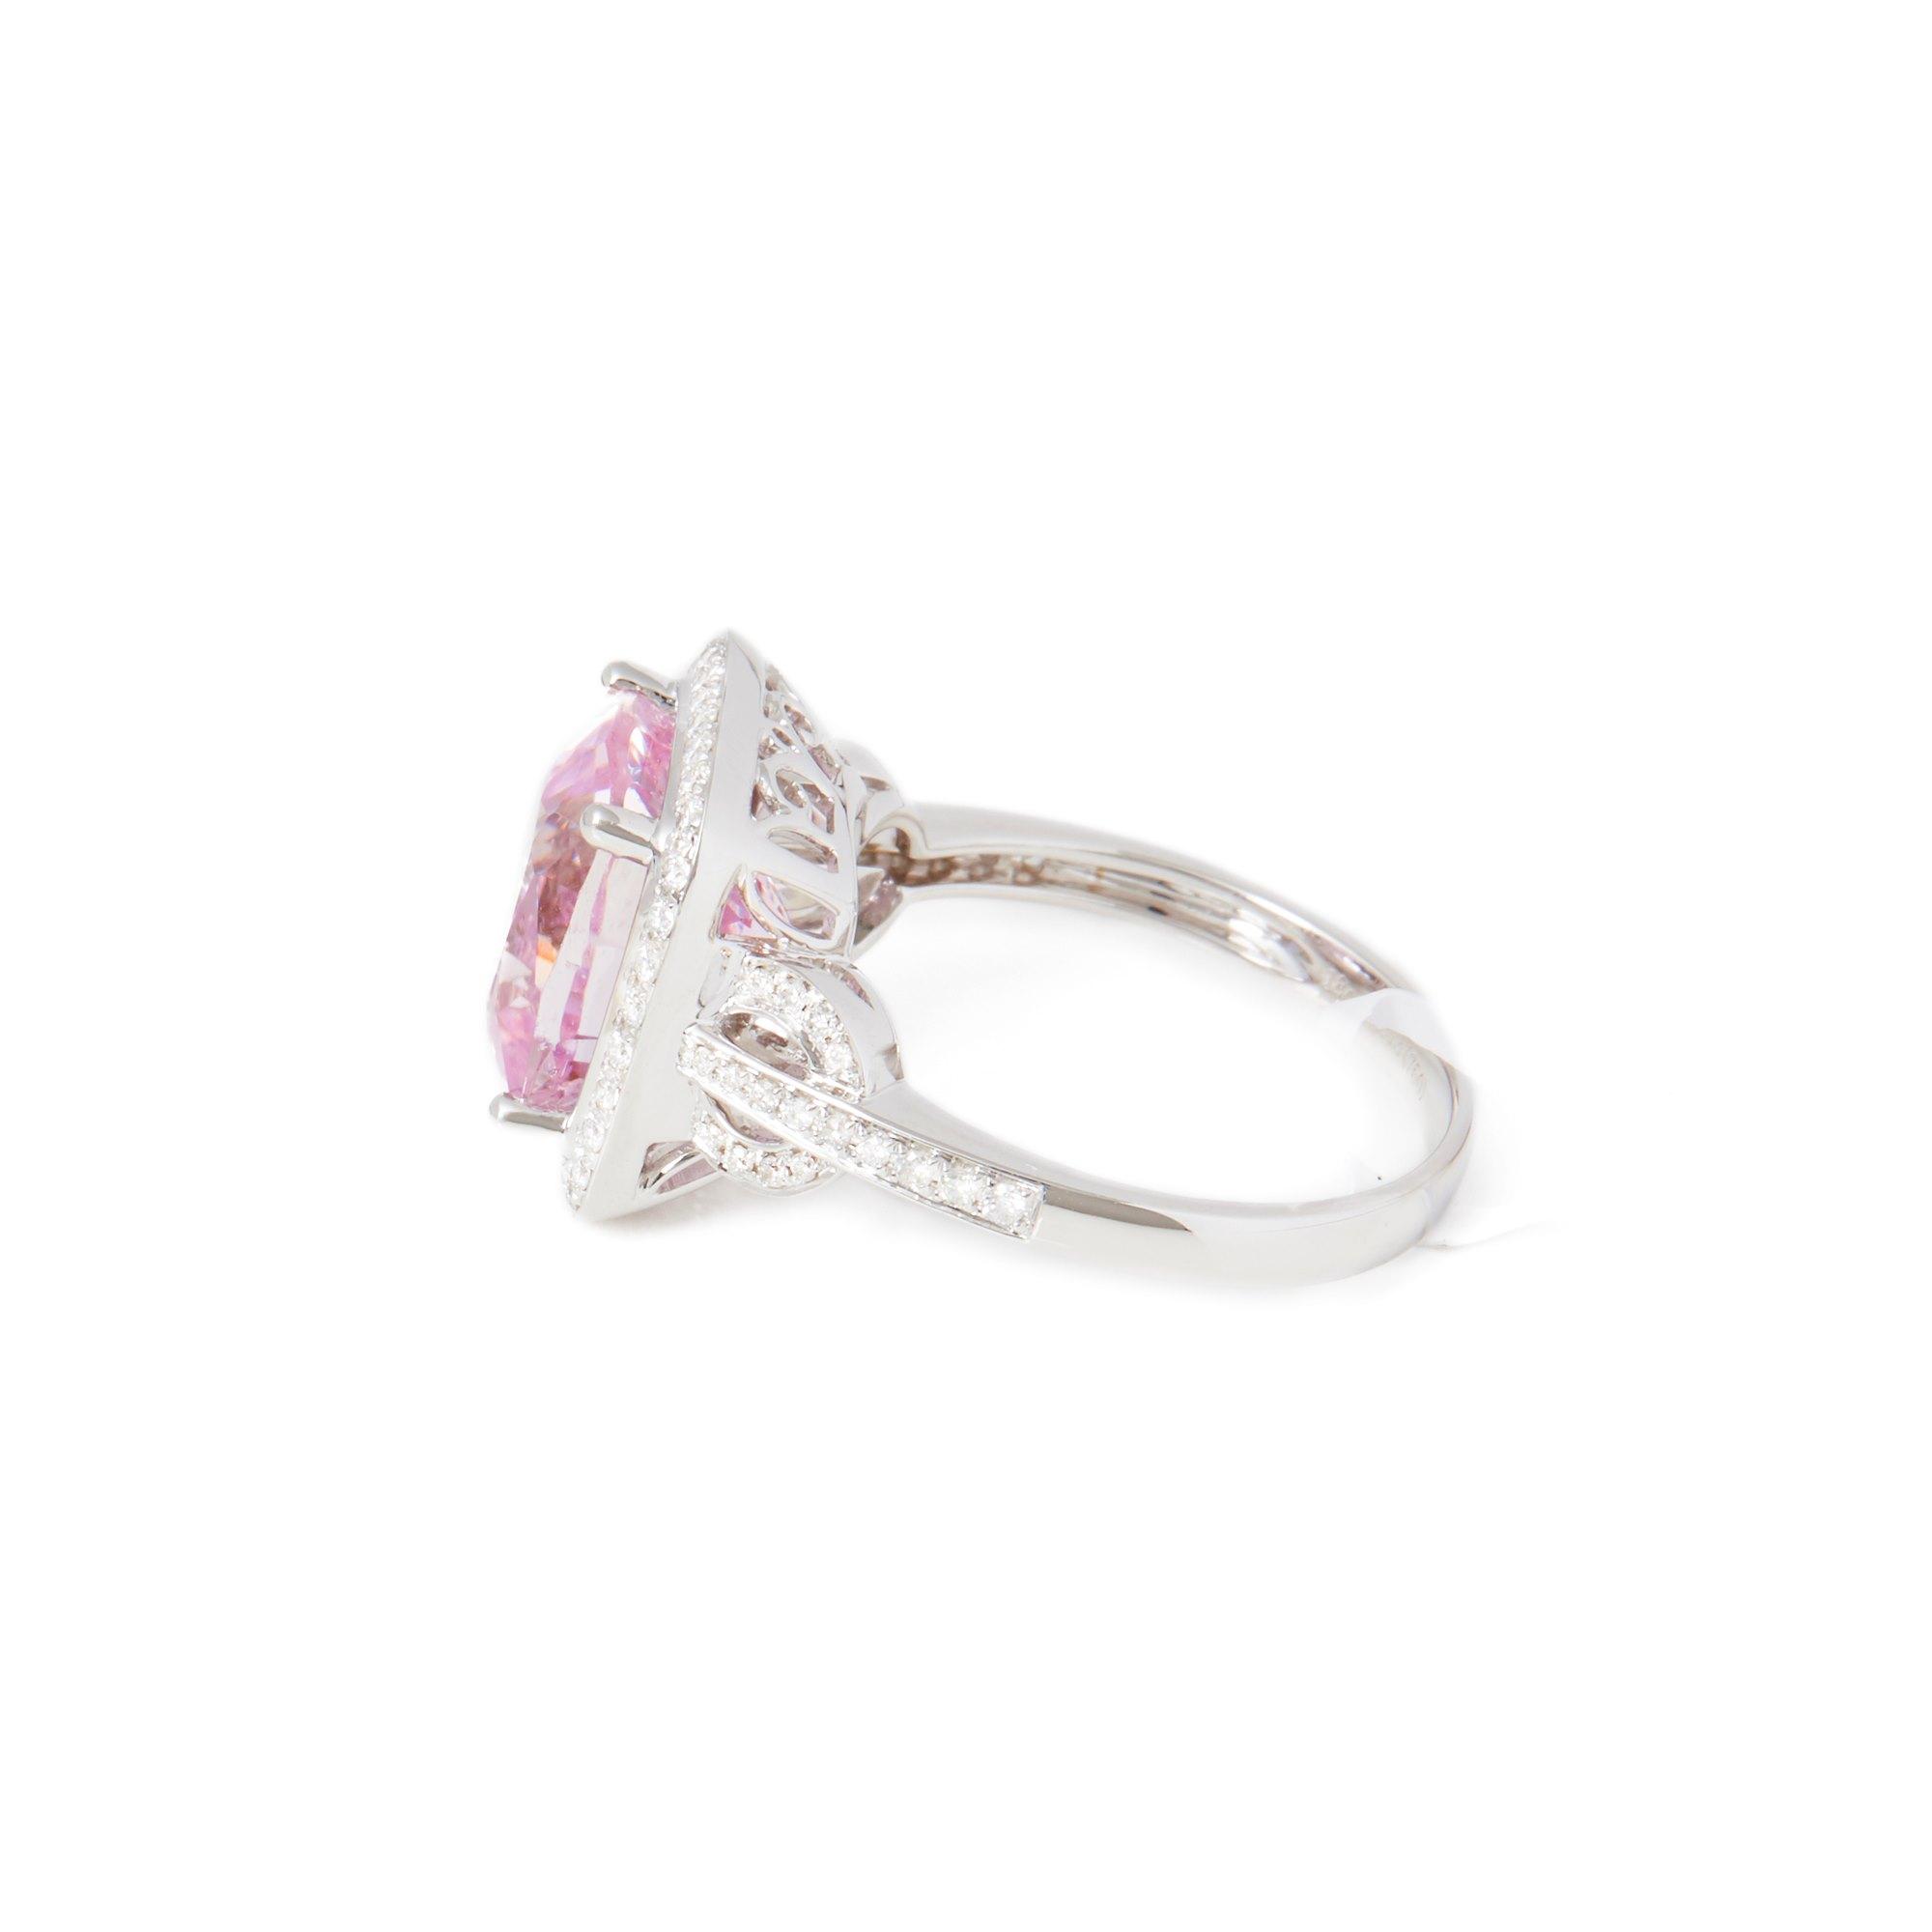 David Jerome Certified 5.69ct Cushion Cut Kunzite and Diamond 18ct gold Ring